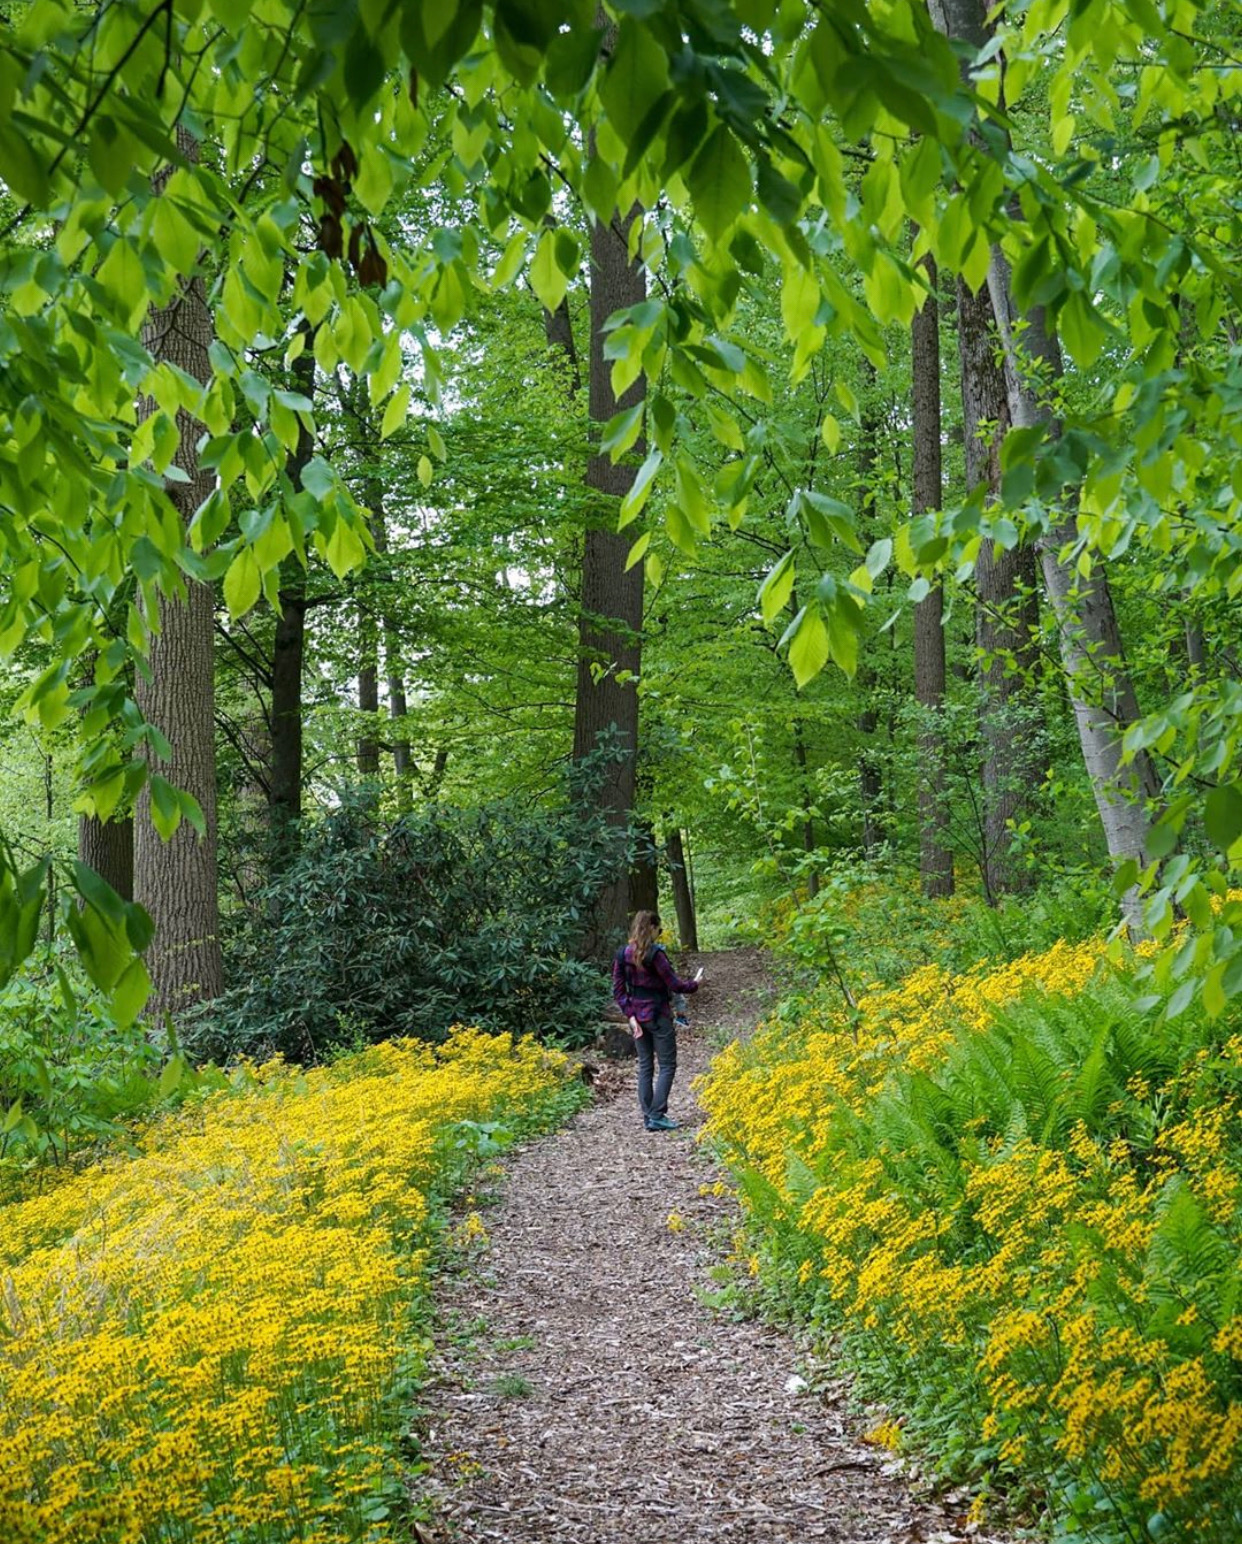 nj mom cora hartshorn arboreetum best gardens and nature centers new jersey